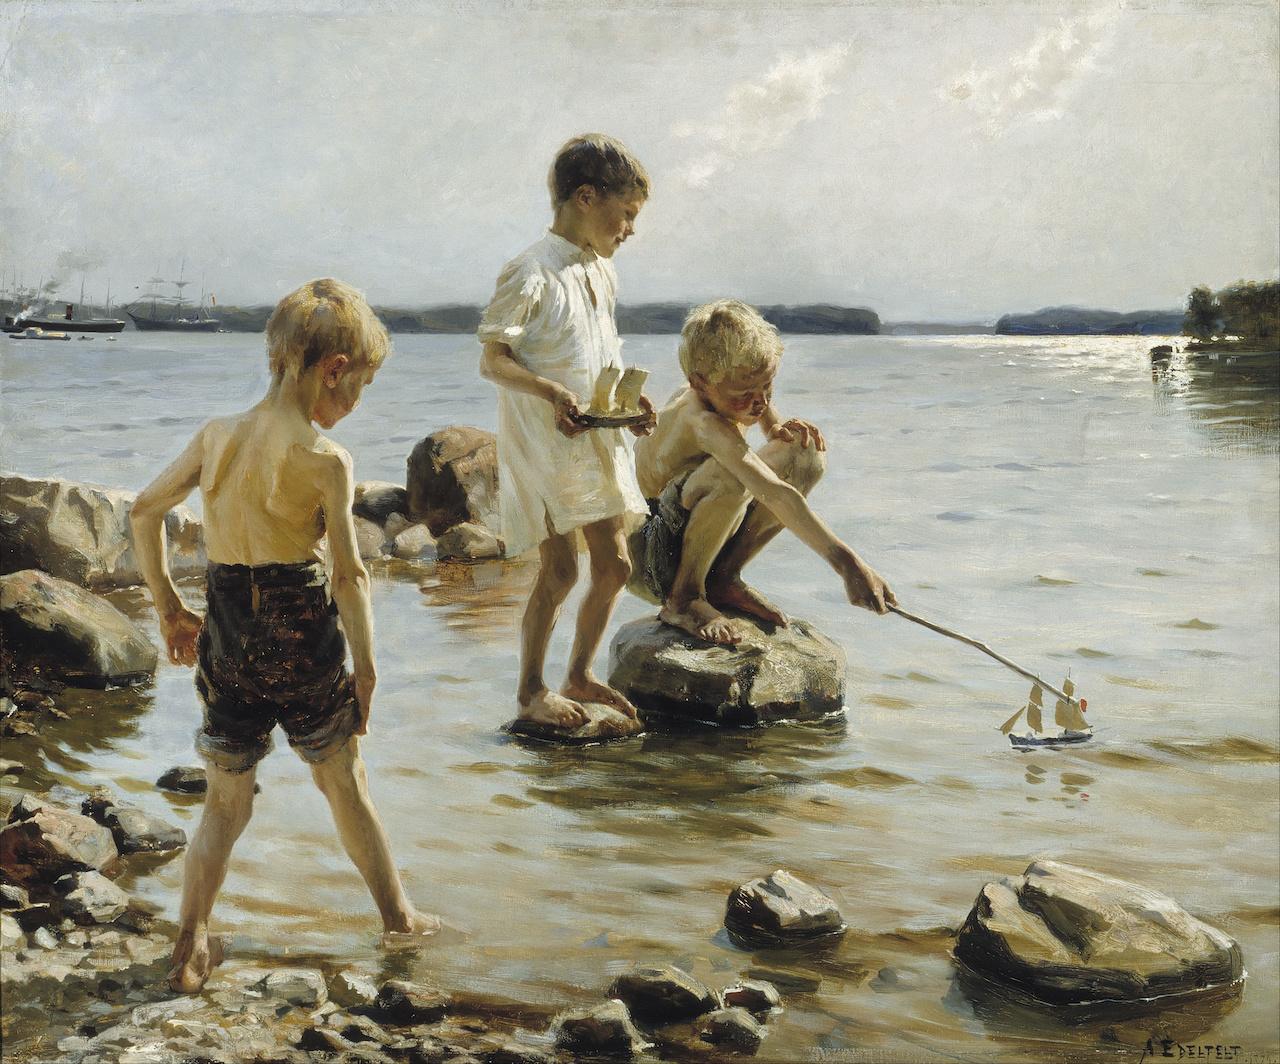 Albert Edelfetl. Boys playing on the Shore. 1884. Öl / Leinwand. 90 x 107,5cm